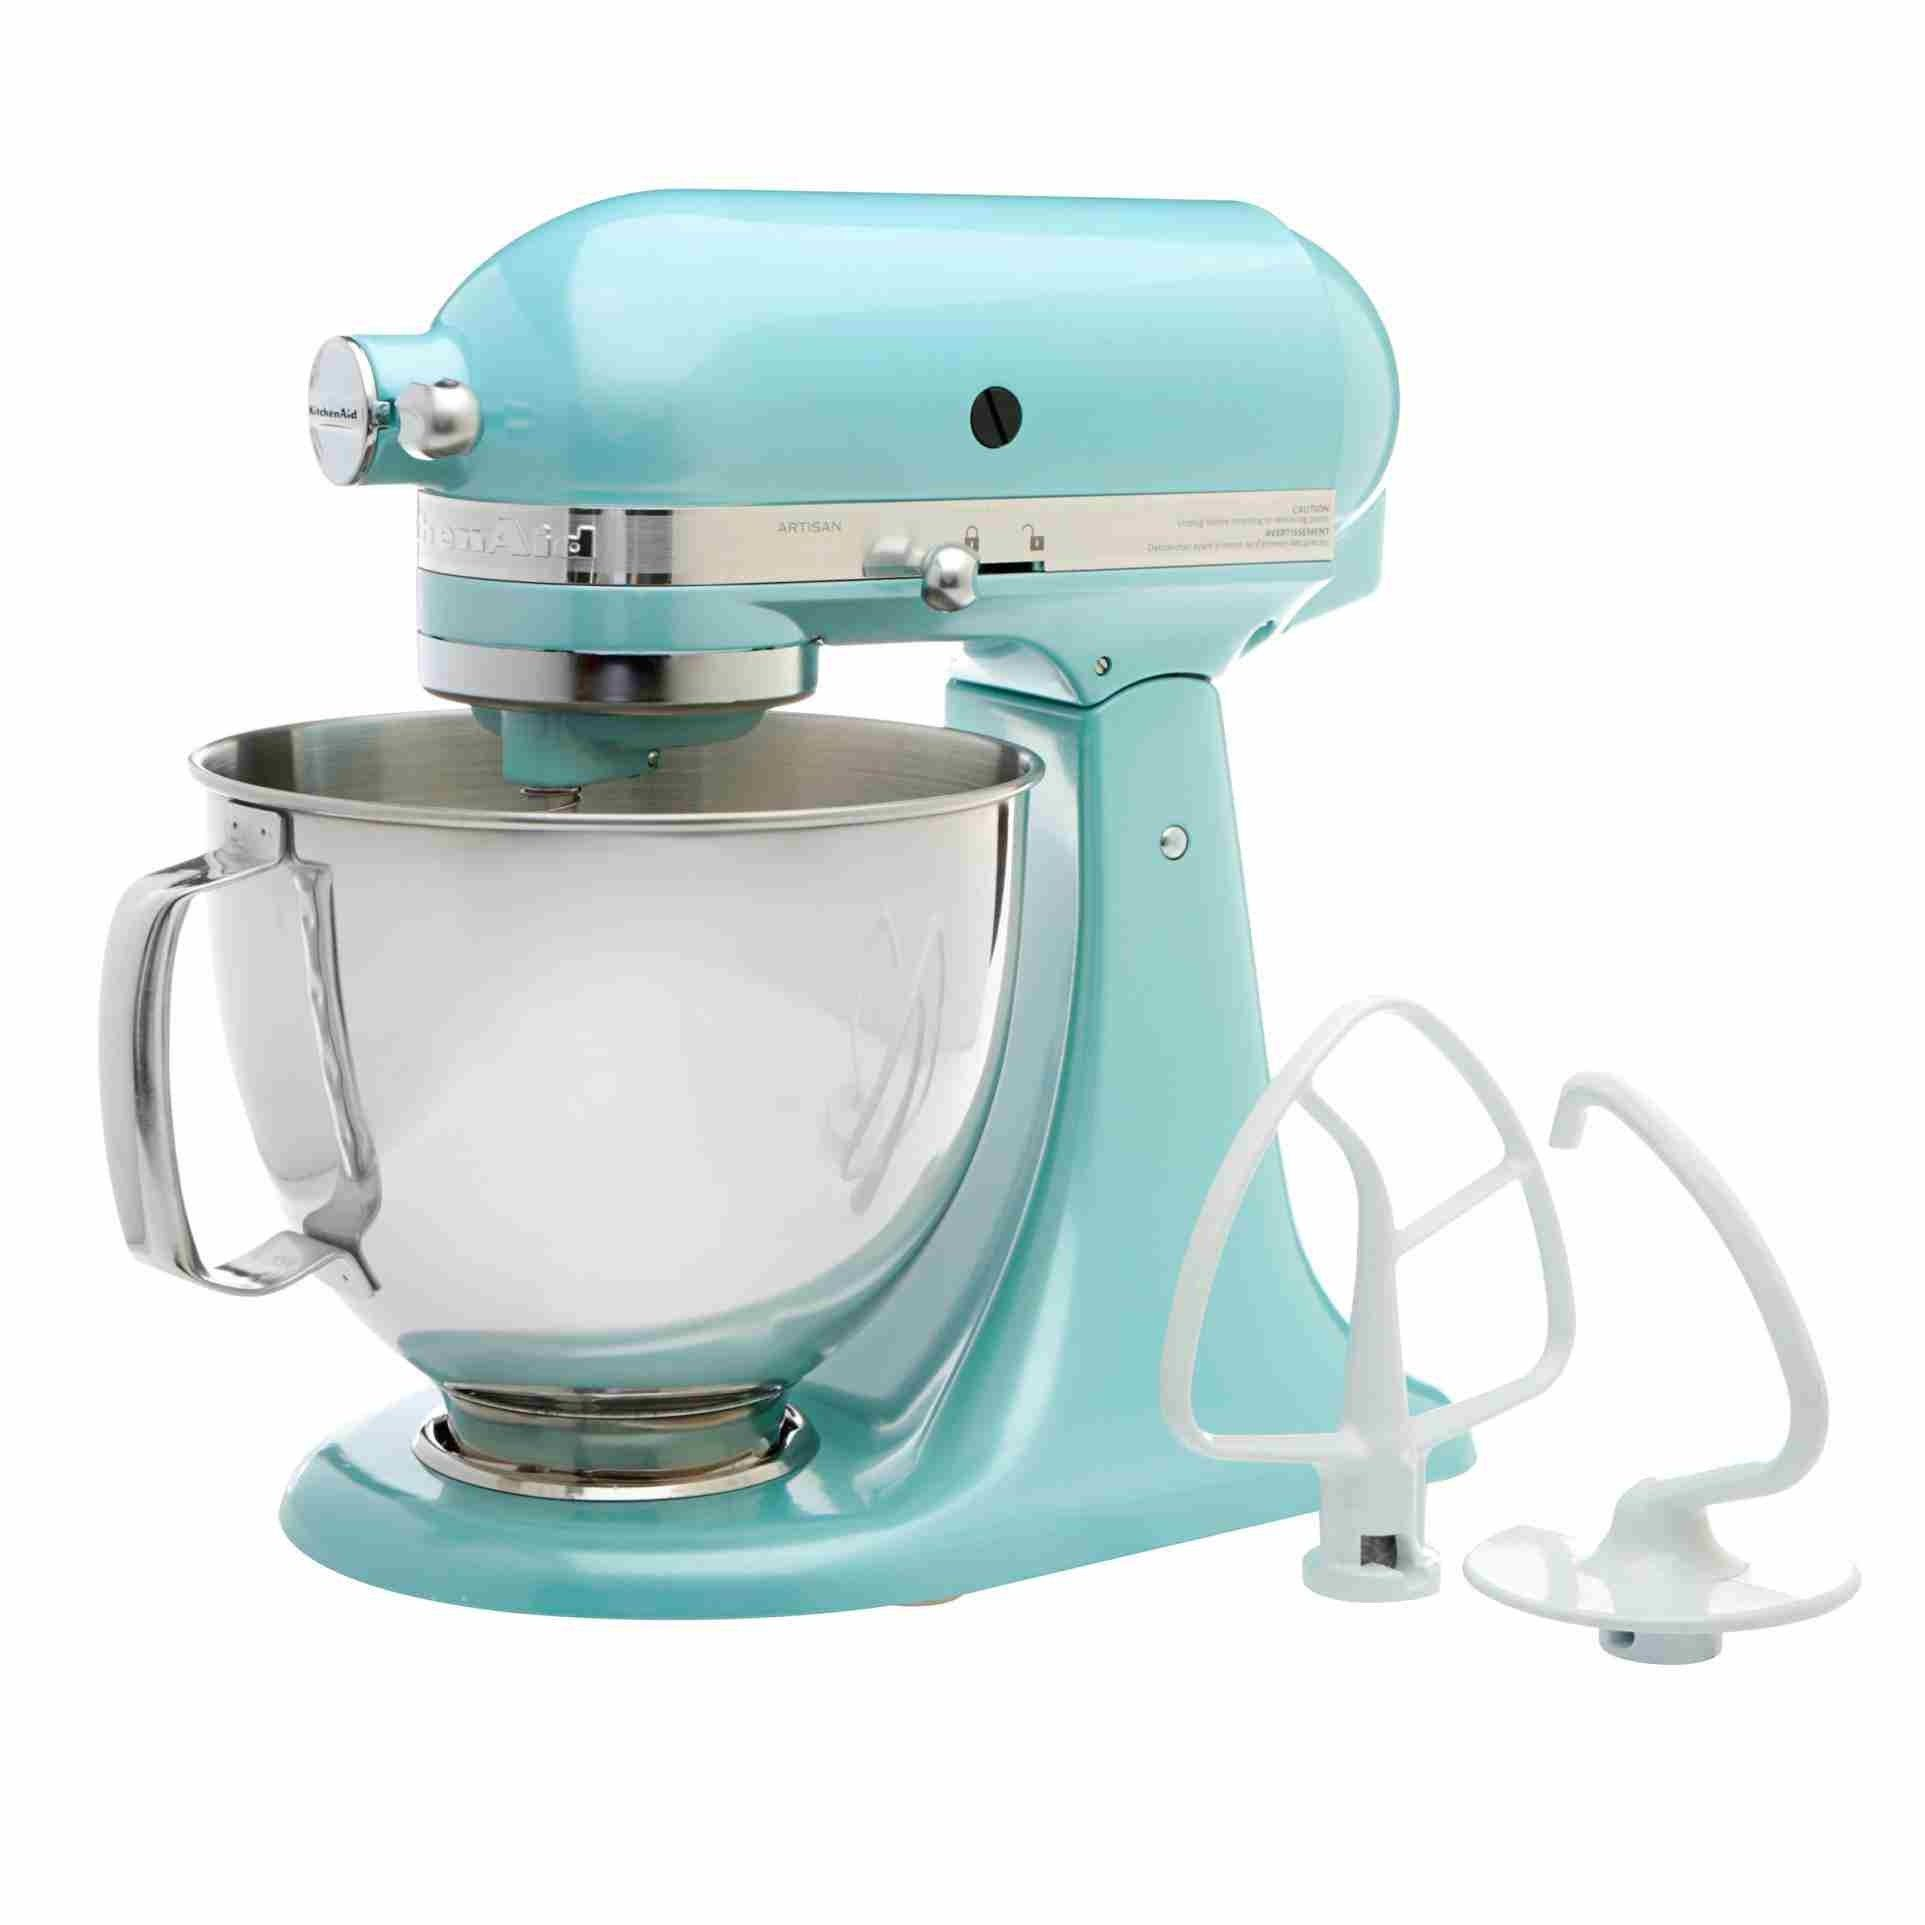 Ice Blue Kitchen Aide Toaster on ice blue refrigerator, ice blue salt shaker, ice blue microwave, ice blue glassware, ice blue fireplace, ice blue mixer, ice blue radio, ice blue plates, ice blue blender, ice blue dinnerware, ice blue pillows,